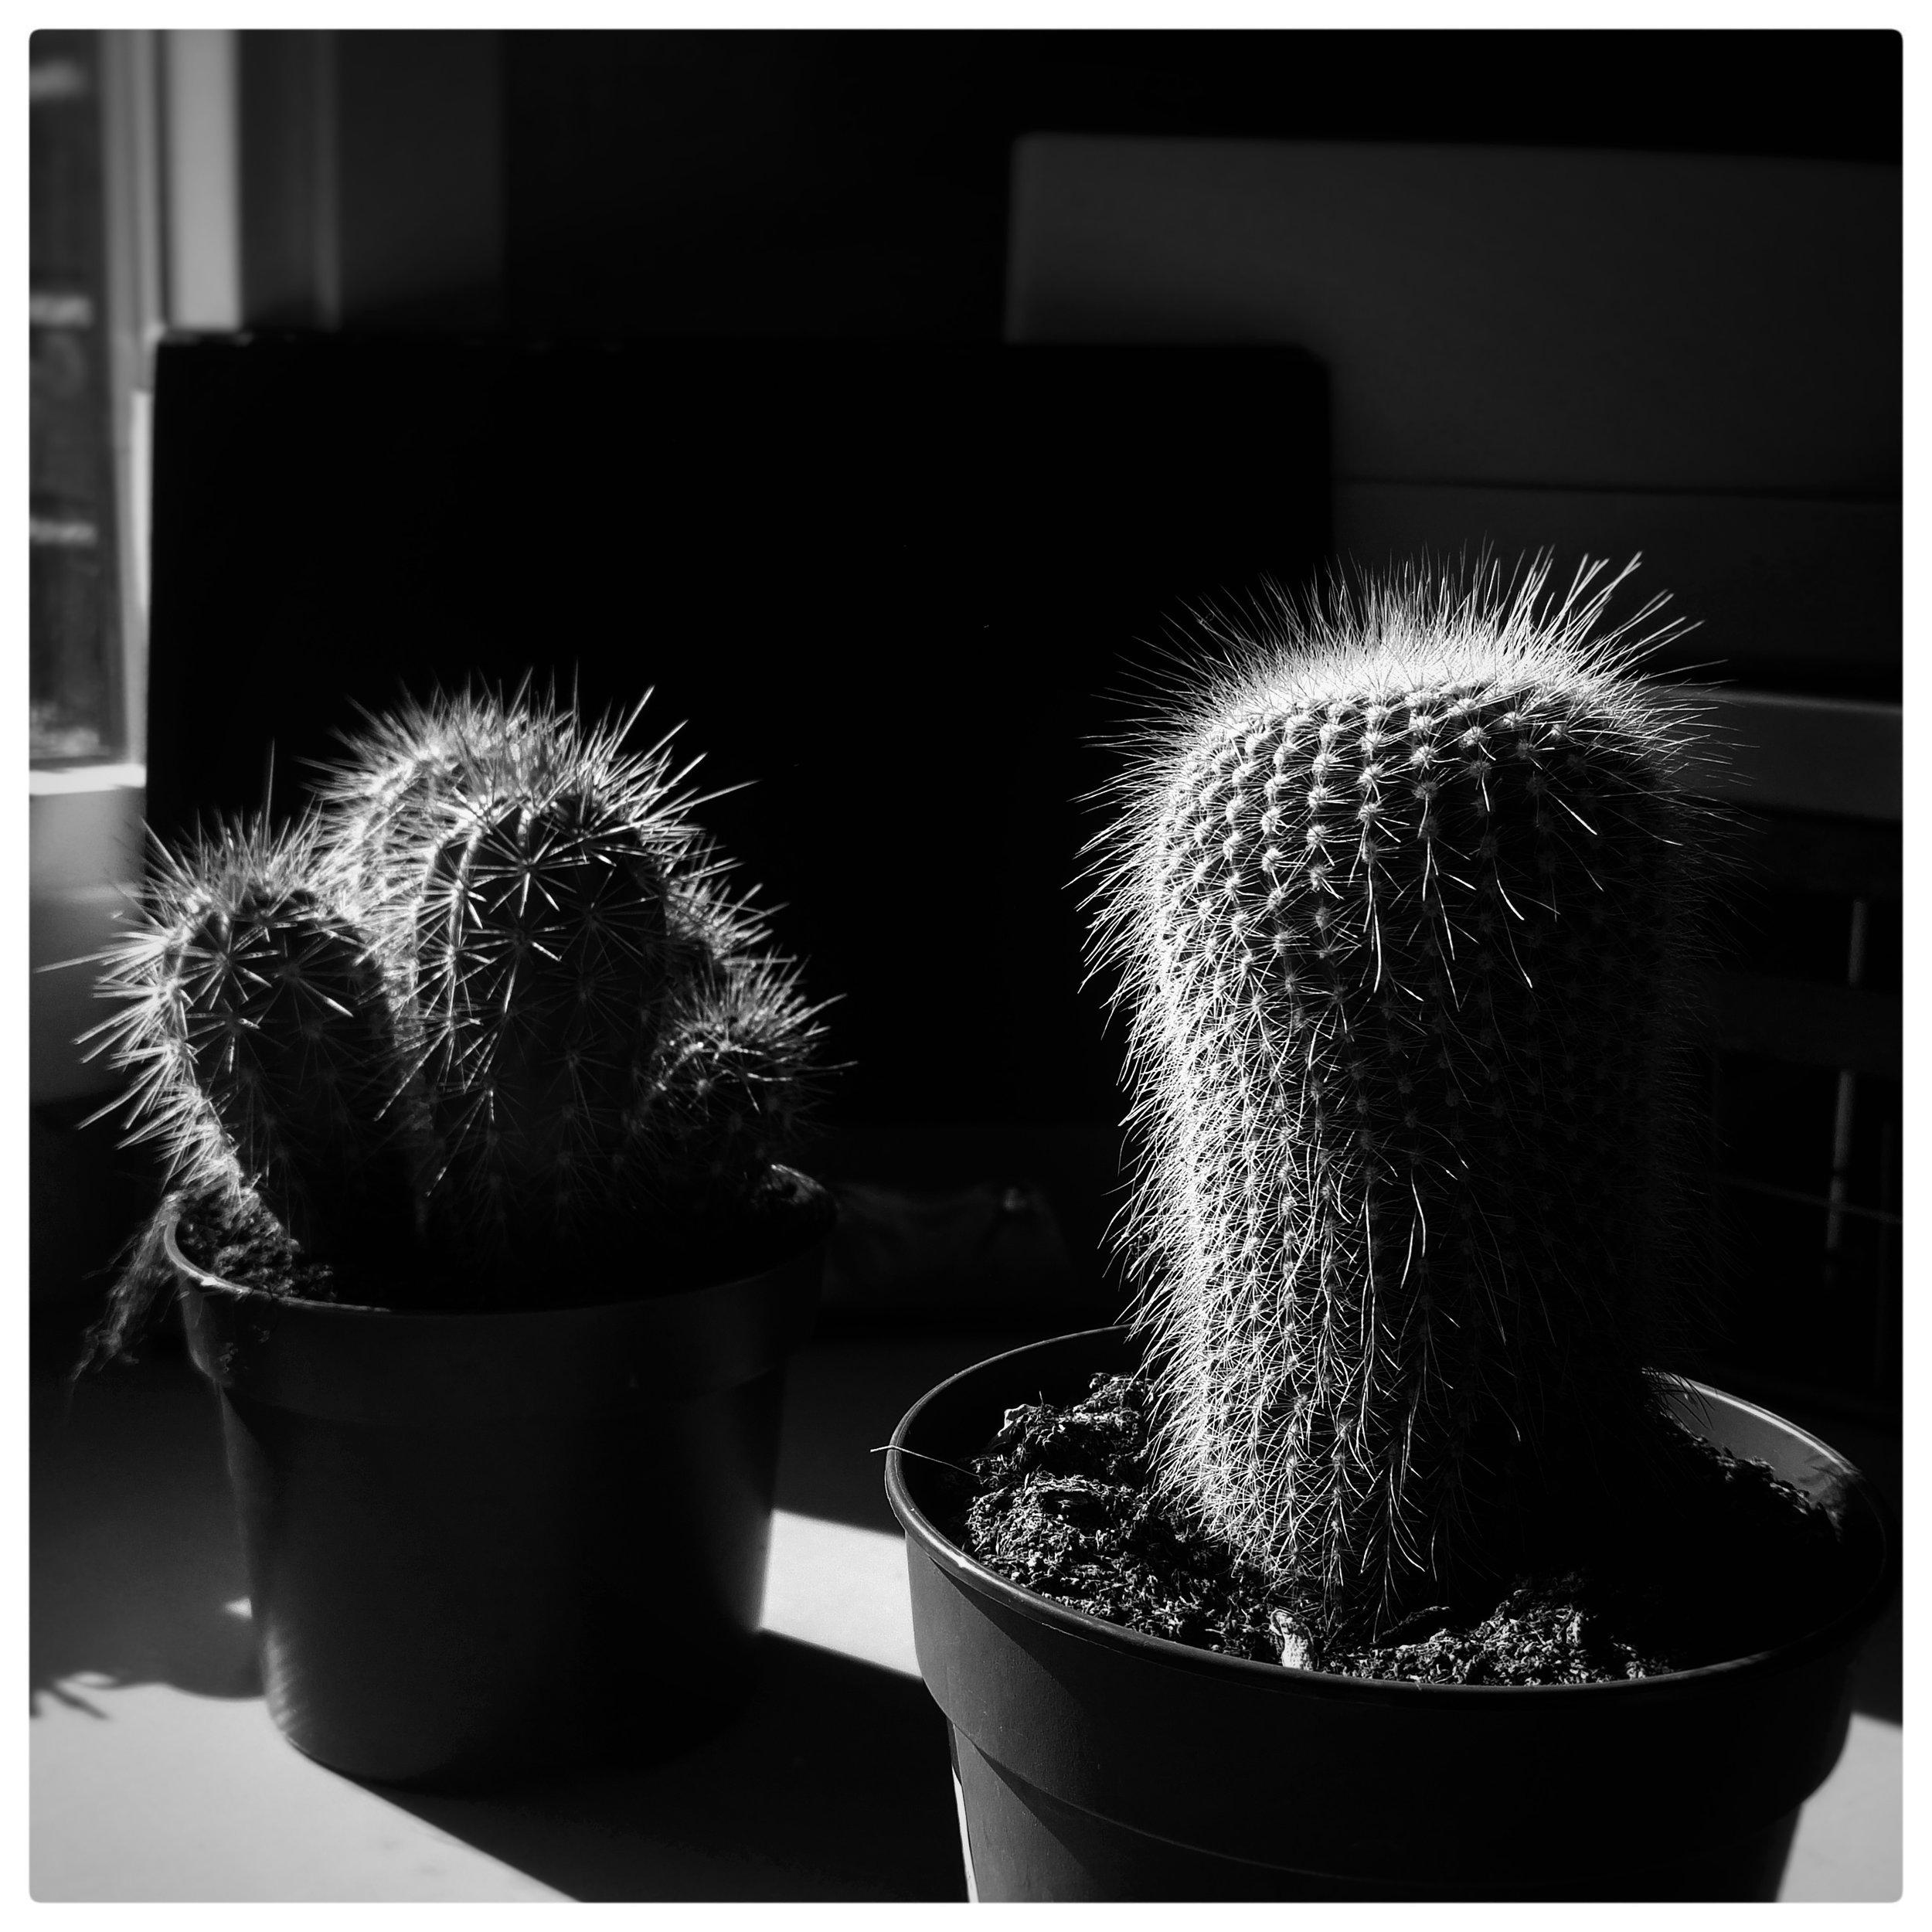 September 27 - Day 271: Prickly Pair